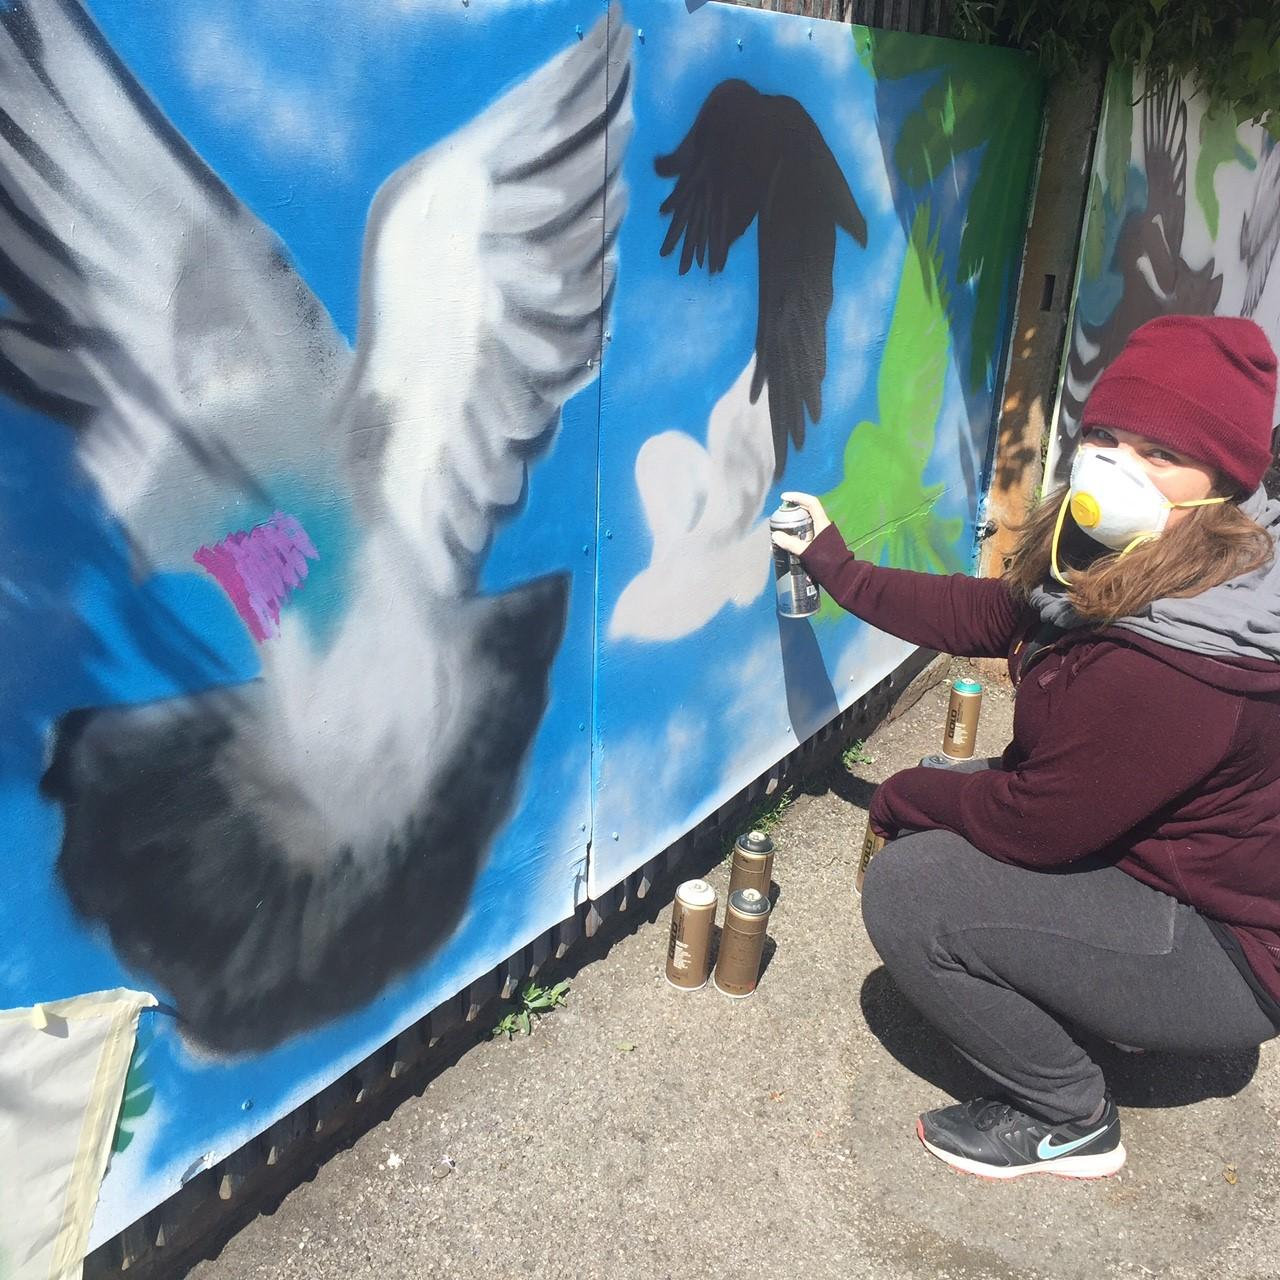 MA Illustration Wix School mural project